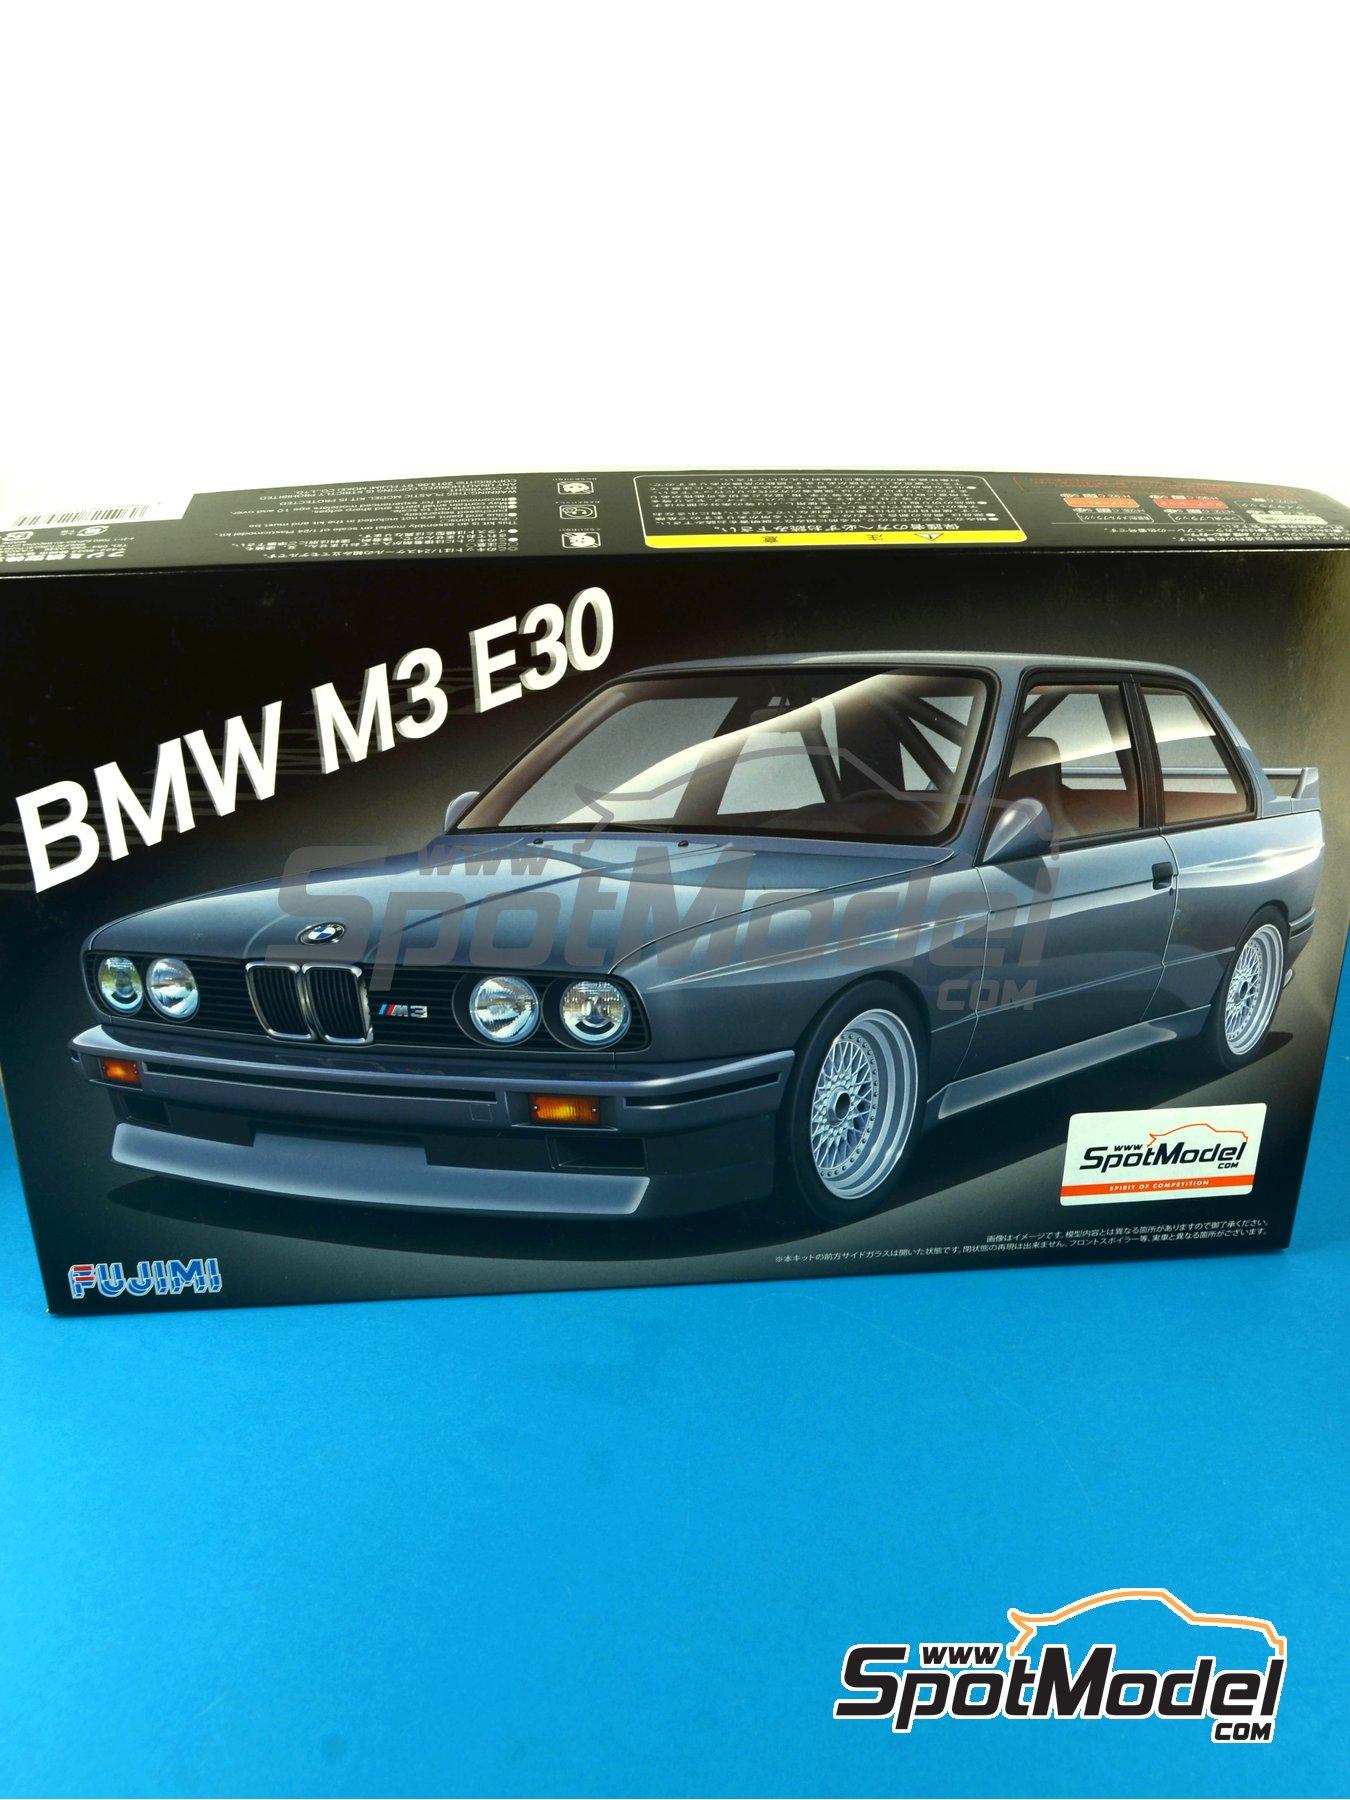 BMW M3 E30 | Model Car Kit In 1/24 Scale Manufactured By Fujimi (